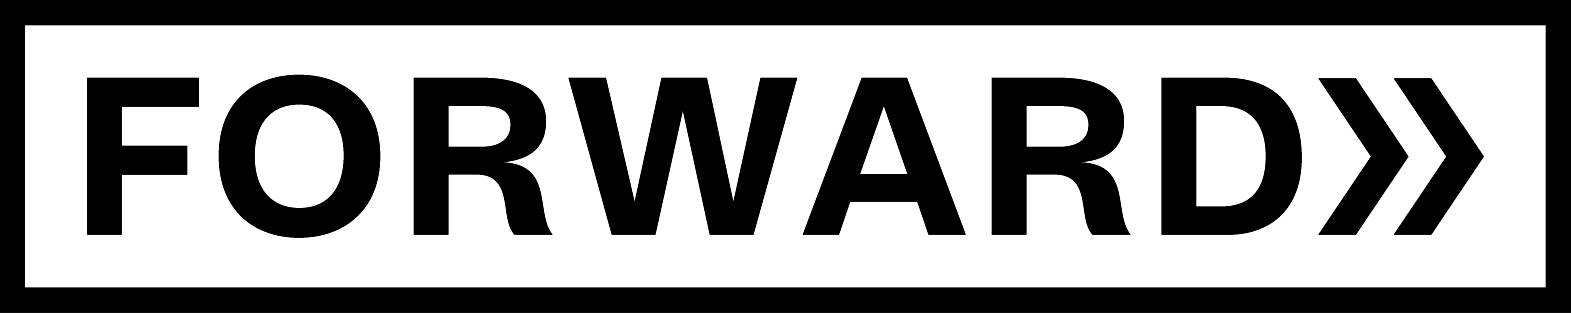 __forward.jpg.jpeg